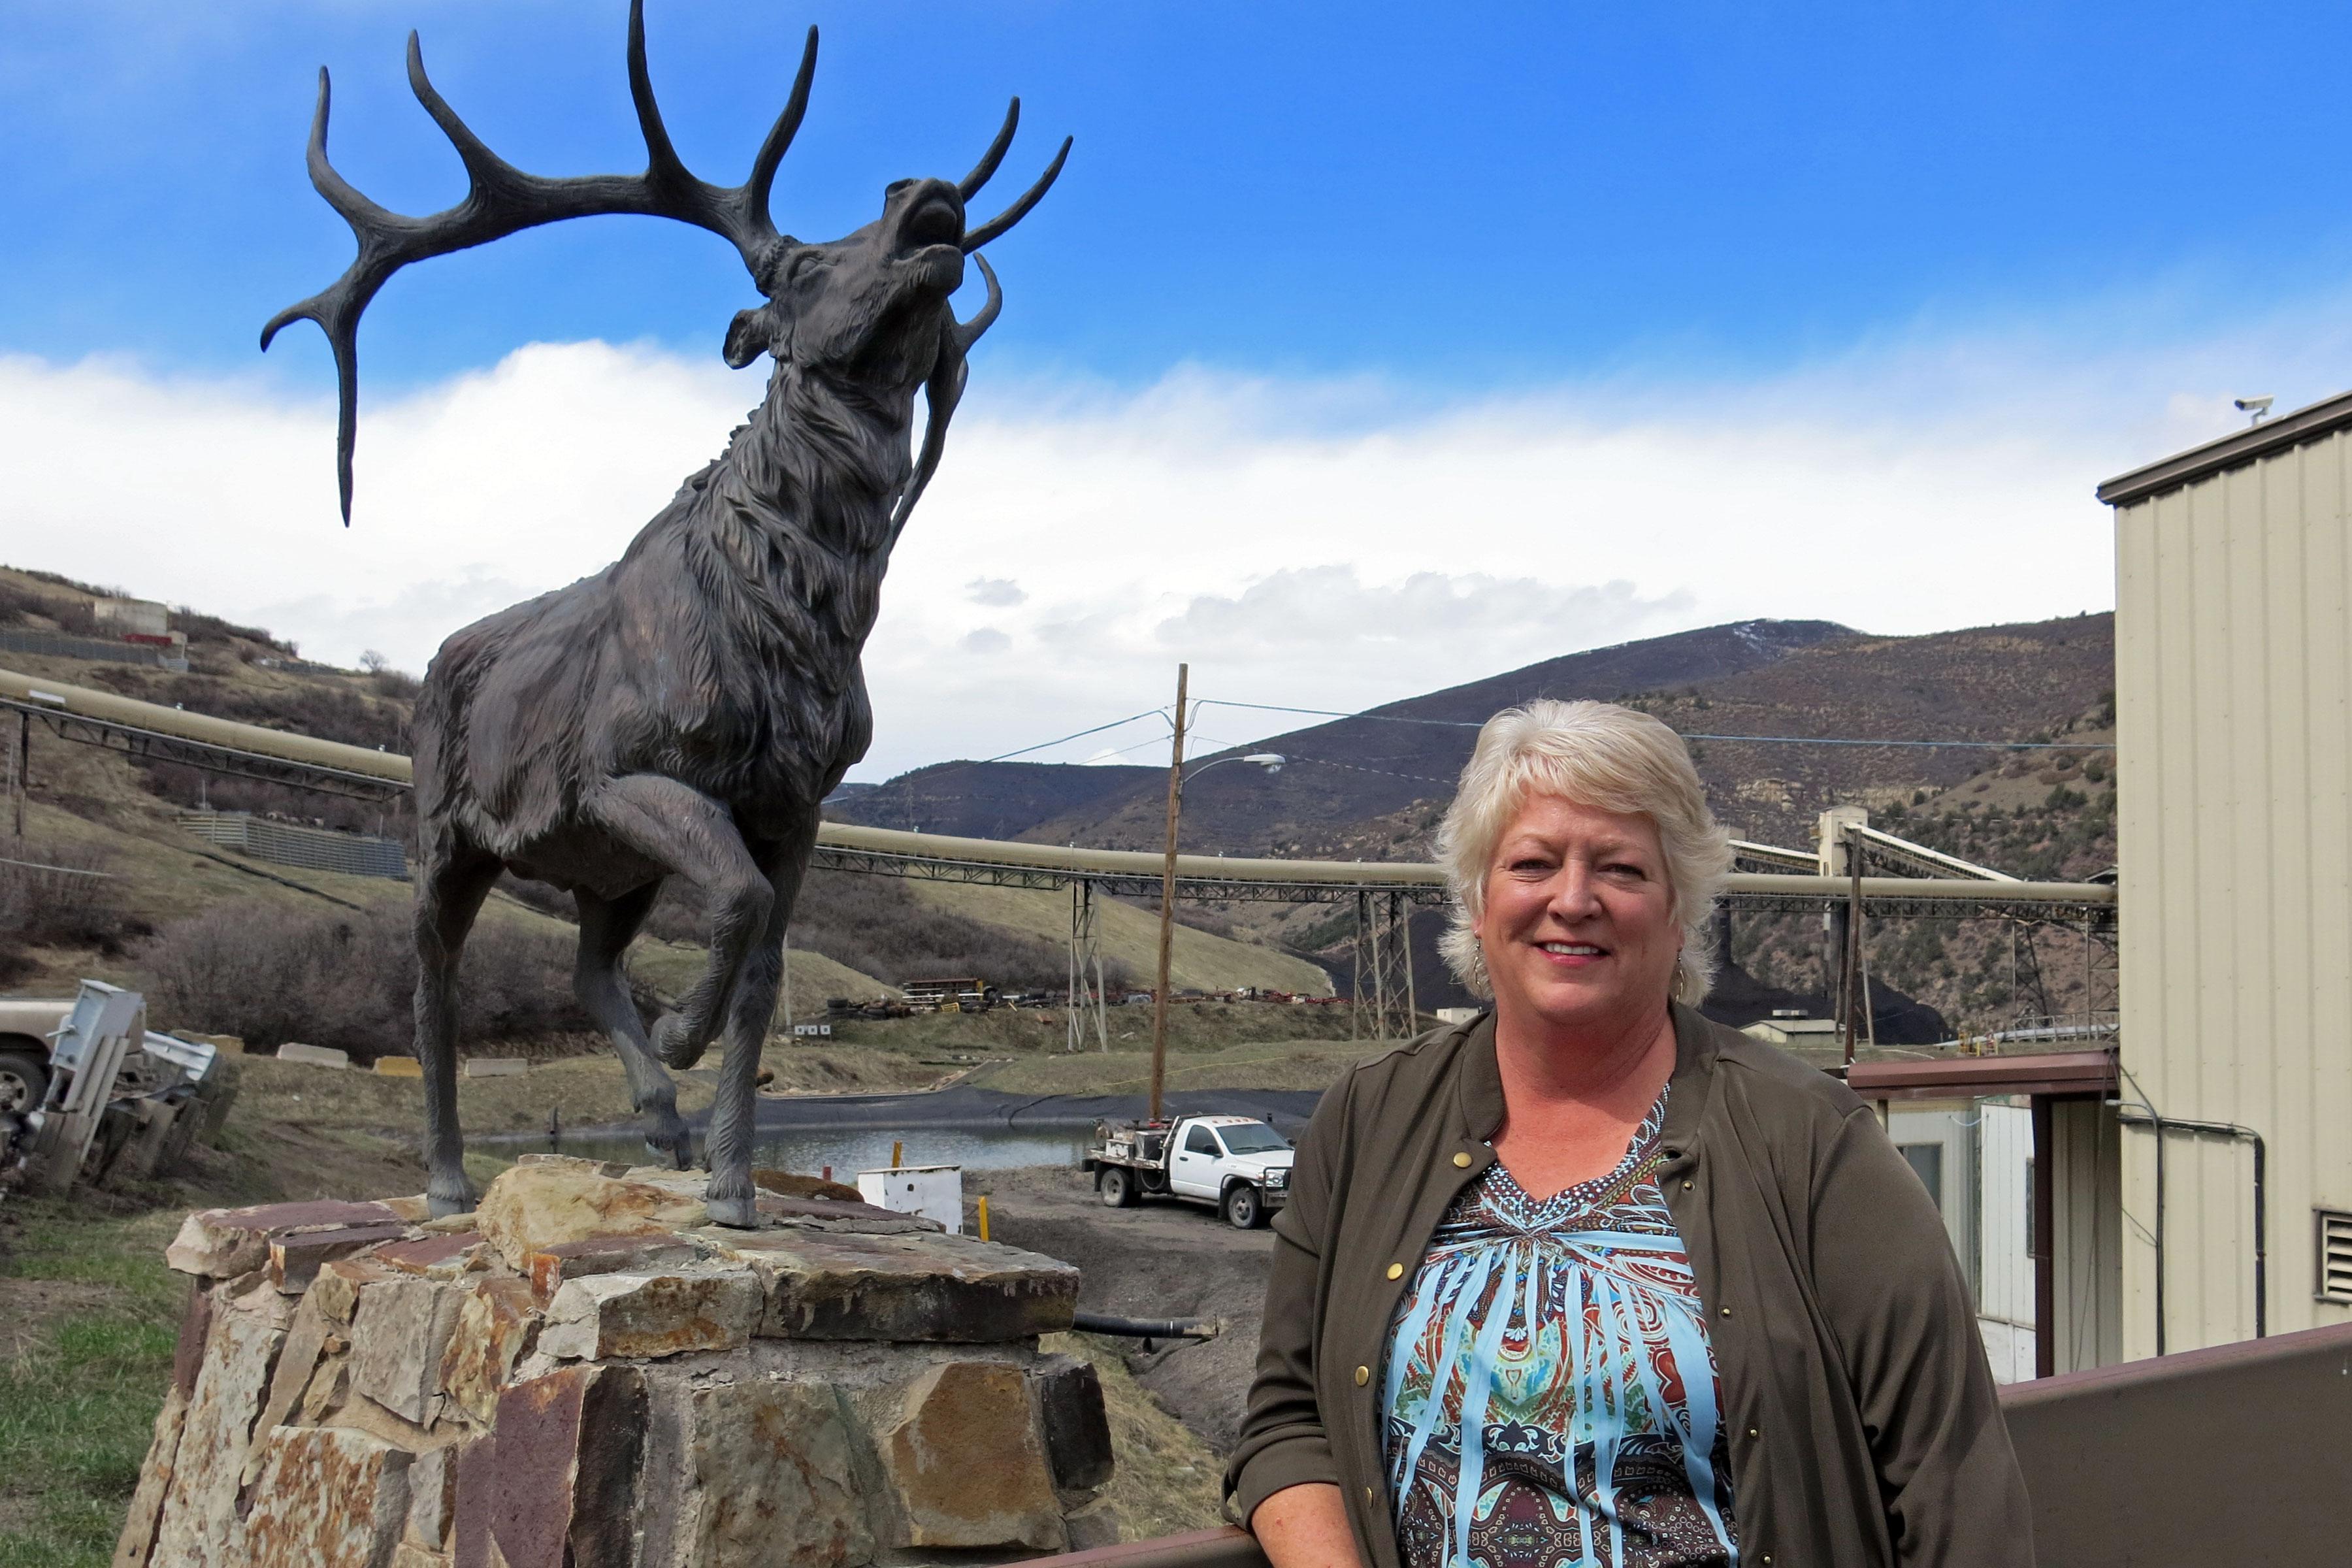 Photo: West Elk Mine Coal 1 | Kathy Welt - GHood